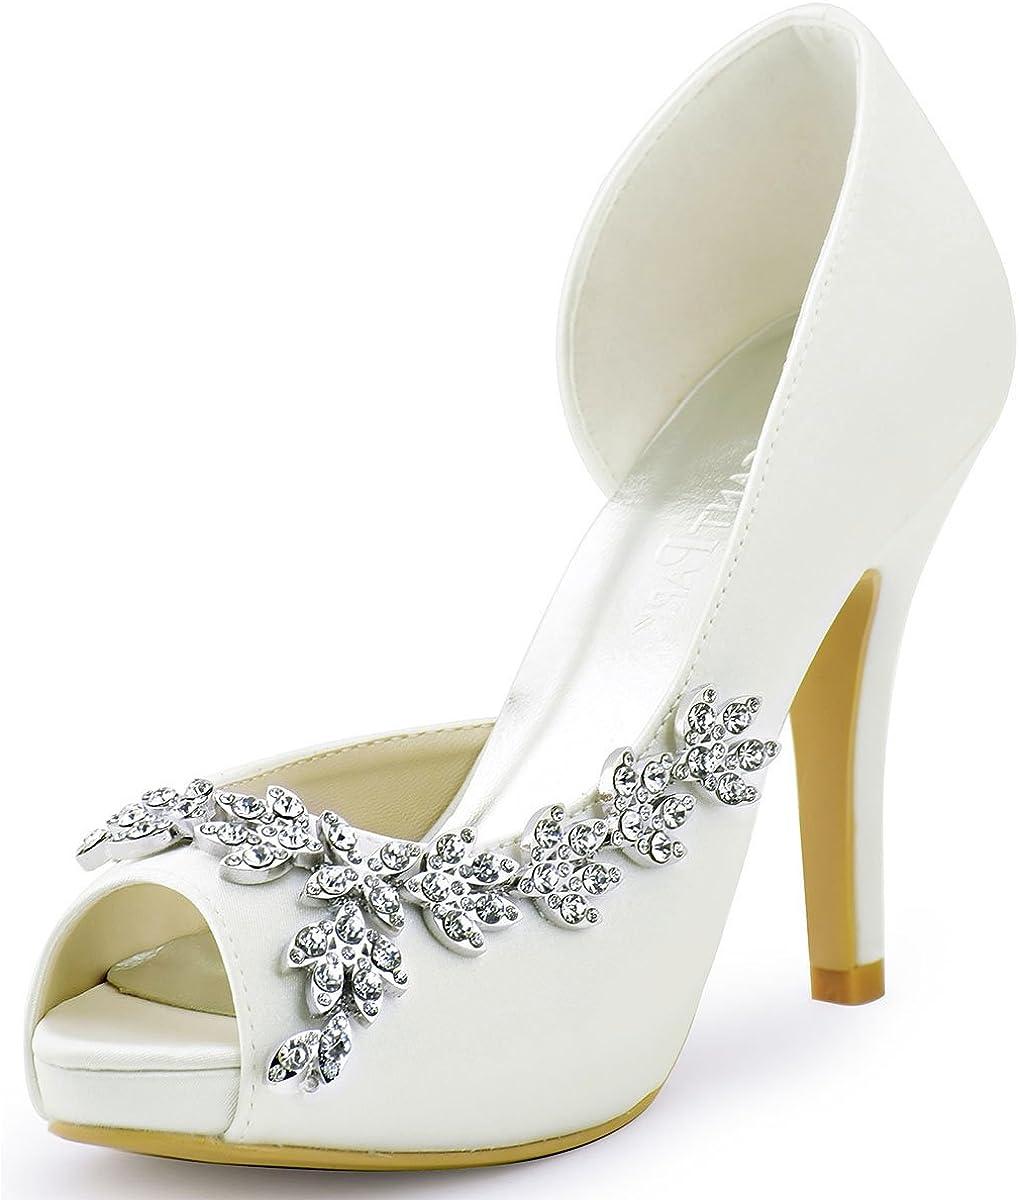 ElegantPark Wedding Shoes for Max 62% OFF Bride Bridal Heel Platform Sh High Max 48% OFF